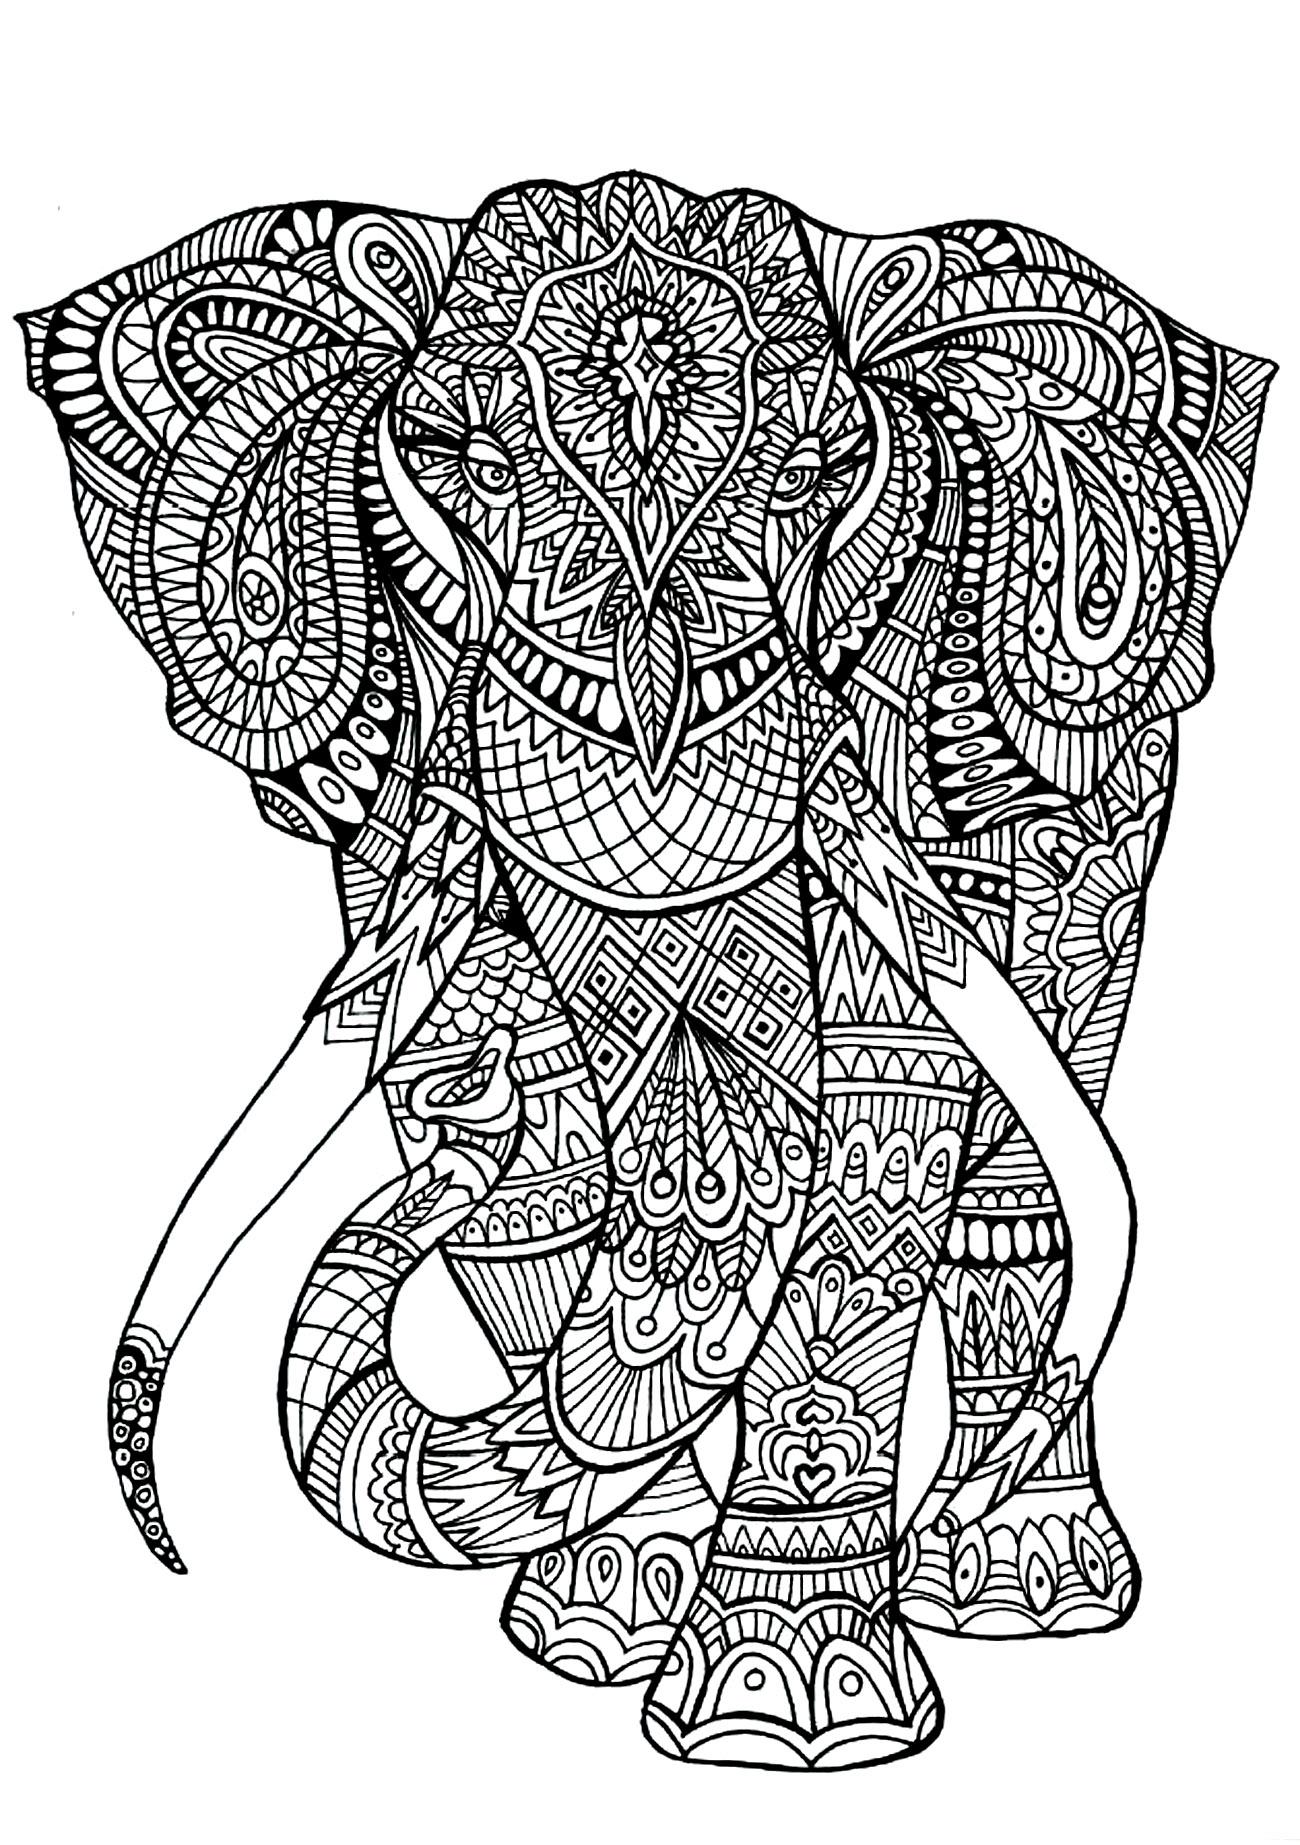 Elephant - Animals Coloring pages - 100% Mandalas Zen ...   mandala colouring sheets animals